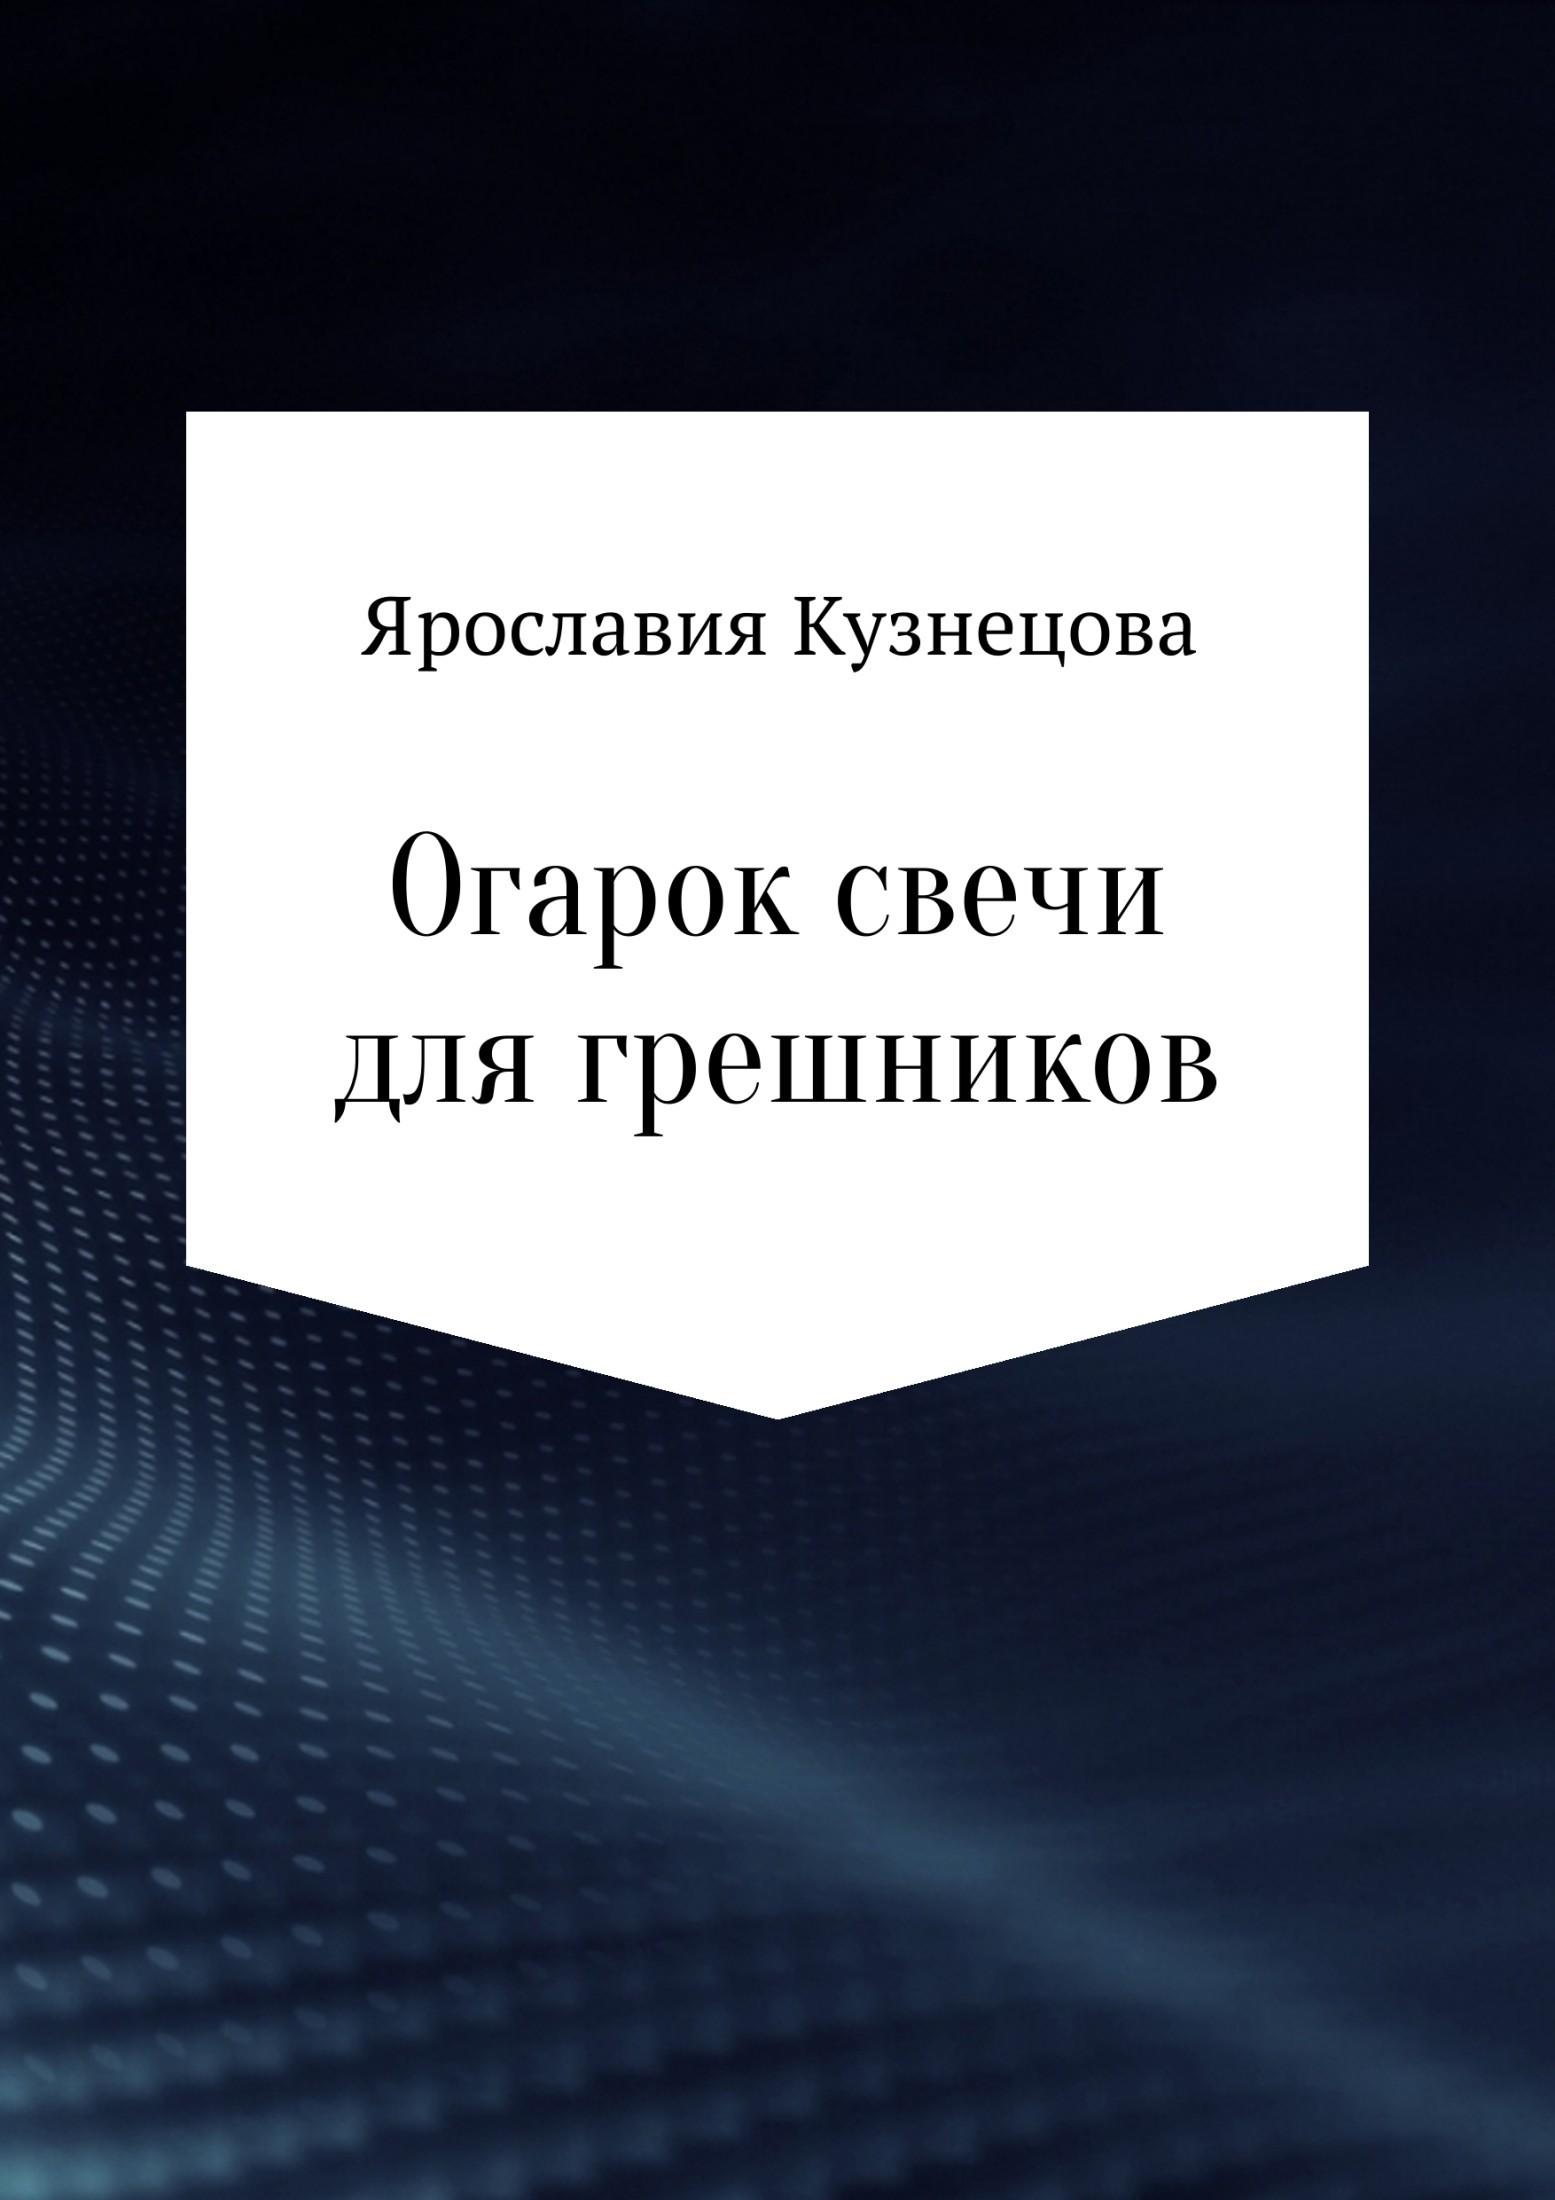 Ярославия Кузнецова «Огарок свечи для грешников»